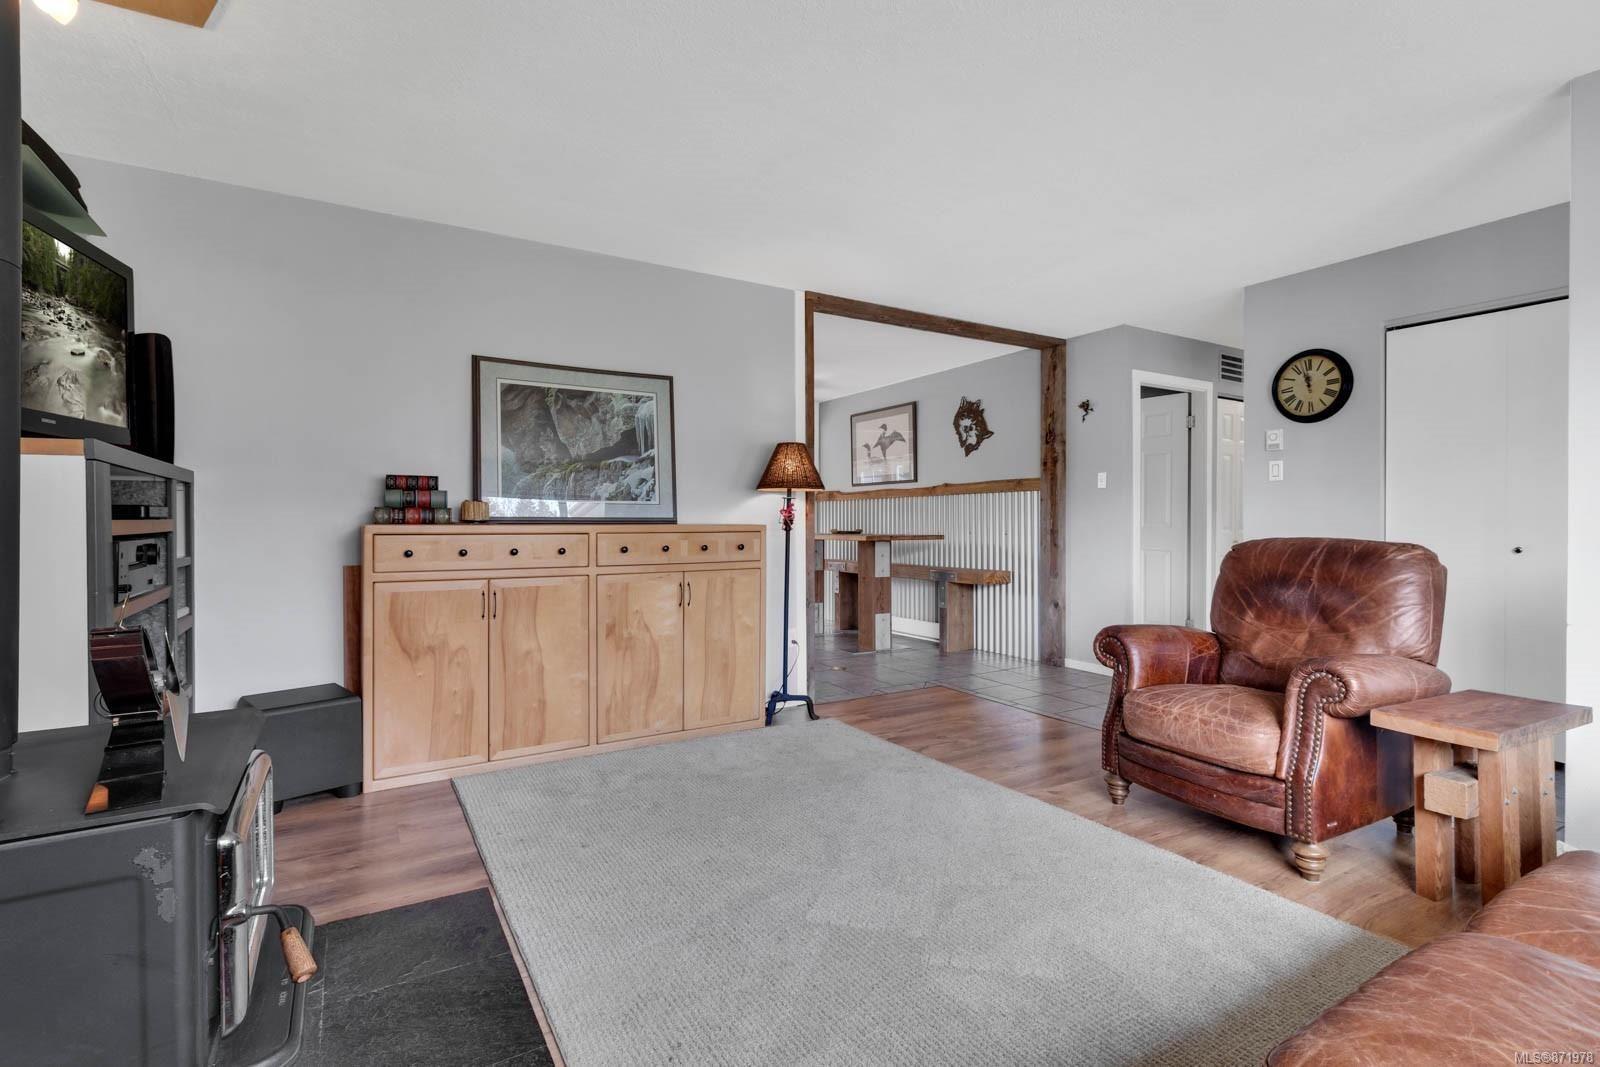 Photo 12: Photos: 1539 Chilcotin Cres in : CV Comox (Town of) House for sale (Comox Valley)  : MLS®# 871978